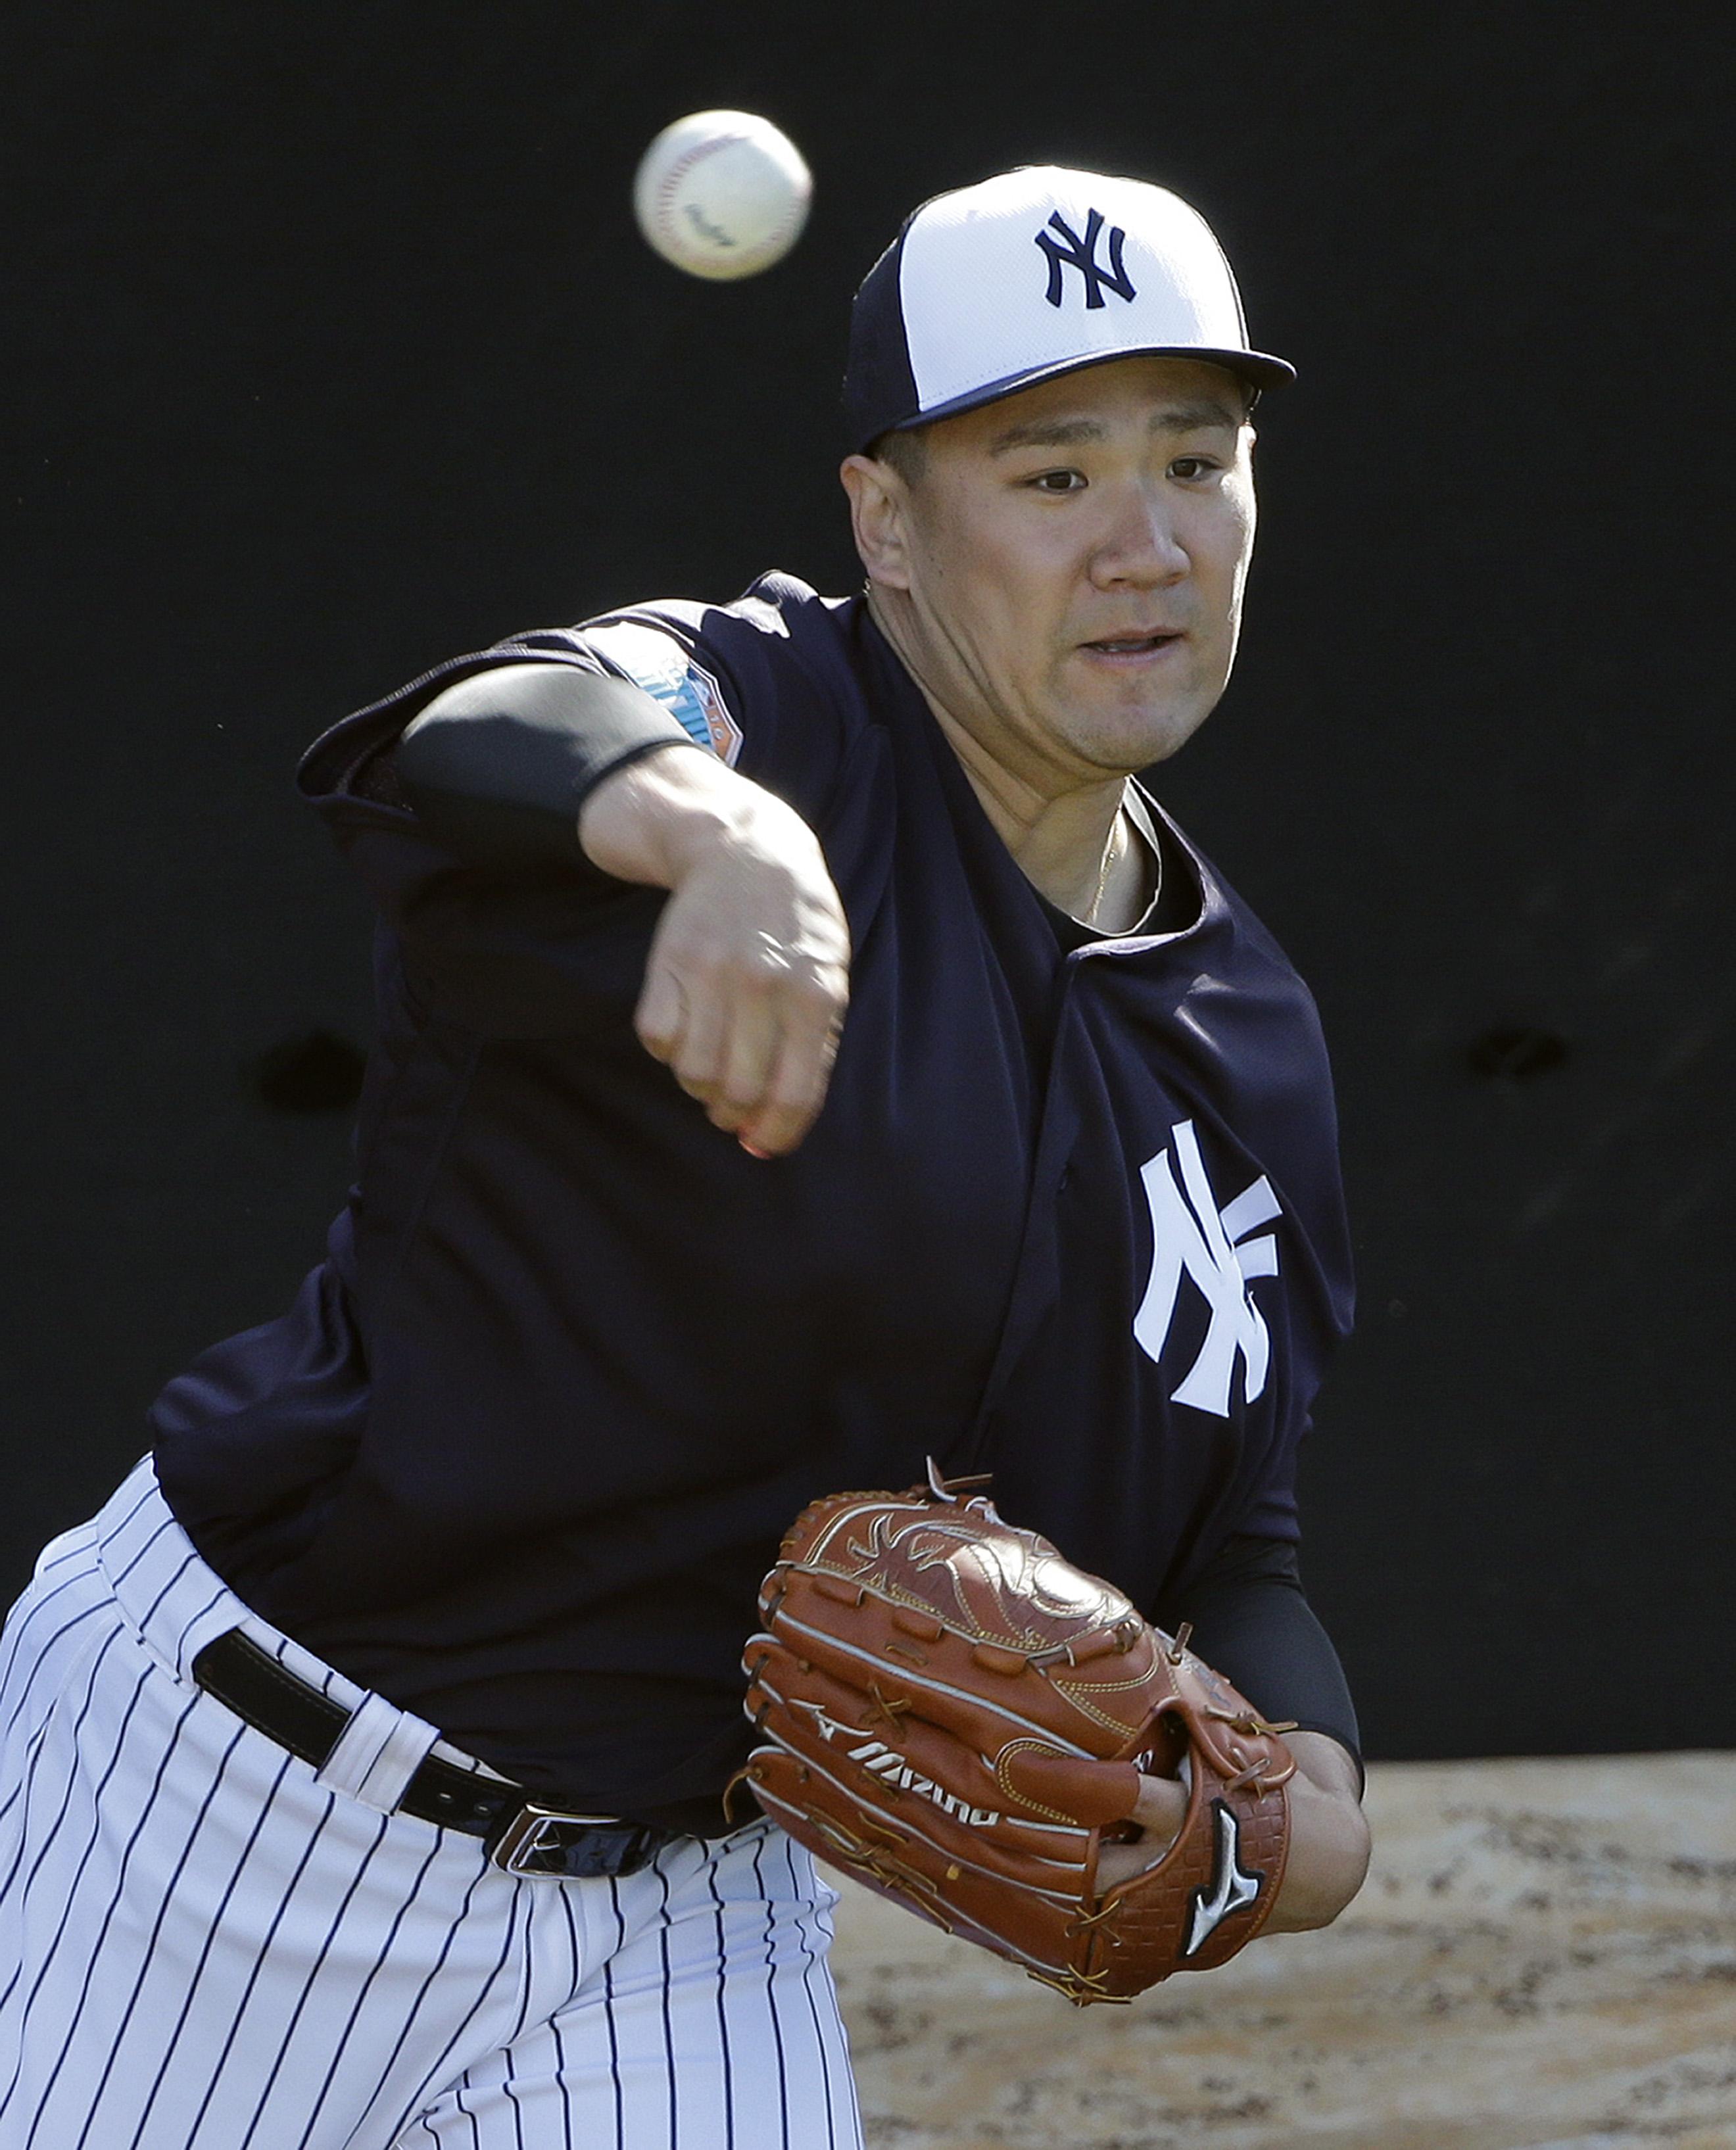 New York Yankees pitcher Masahiro Tanaka, of Japan, throws a bullpen session during a spring training baseball workout Monday, Feb. 22, 2016, in Tampa, Fla. (AP Photo/Chris O'Meara)